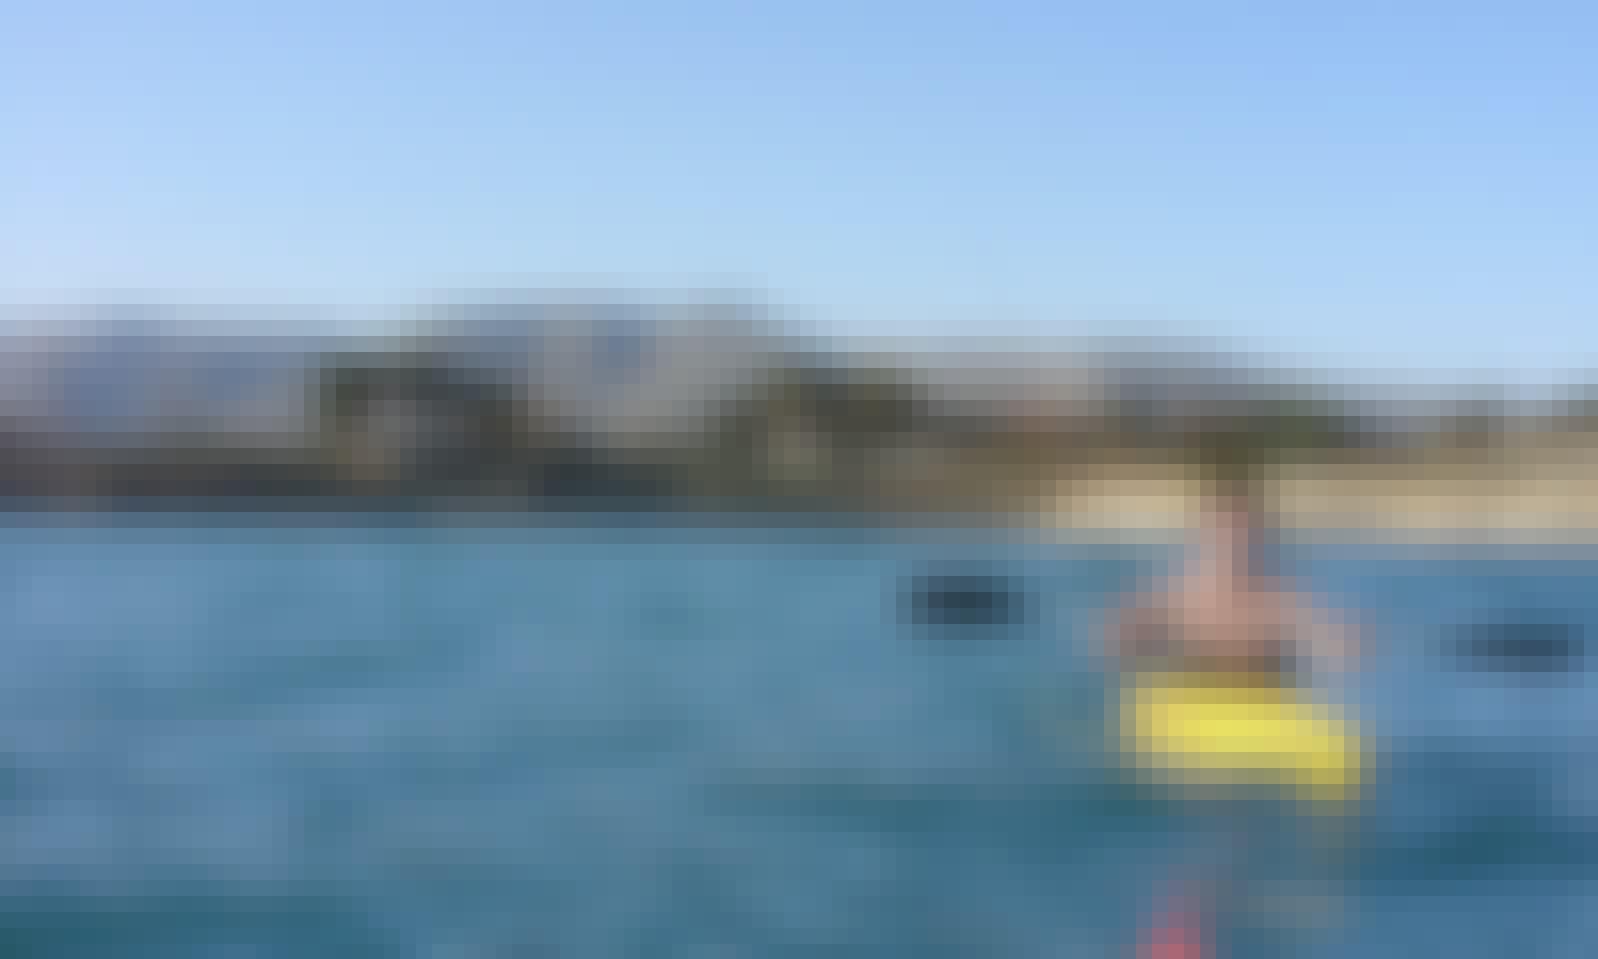 Fishing kayak Tour in Avola - Sicily (Near Siracusa)